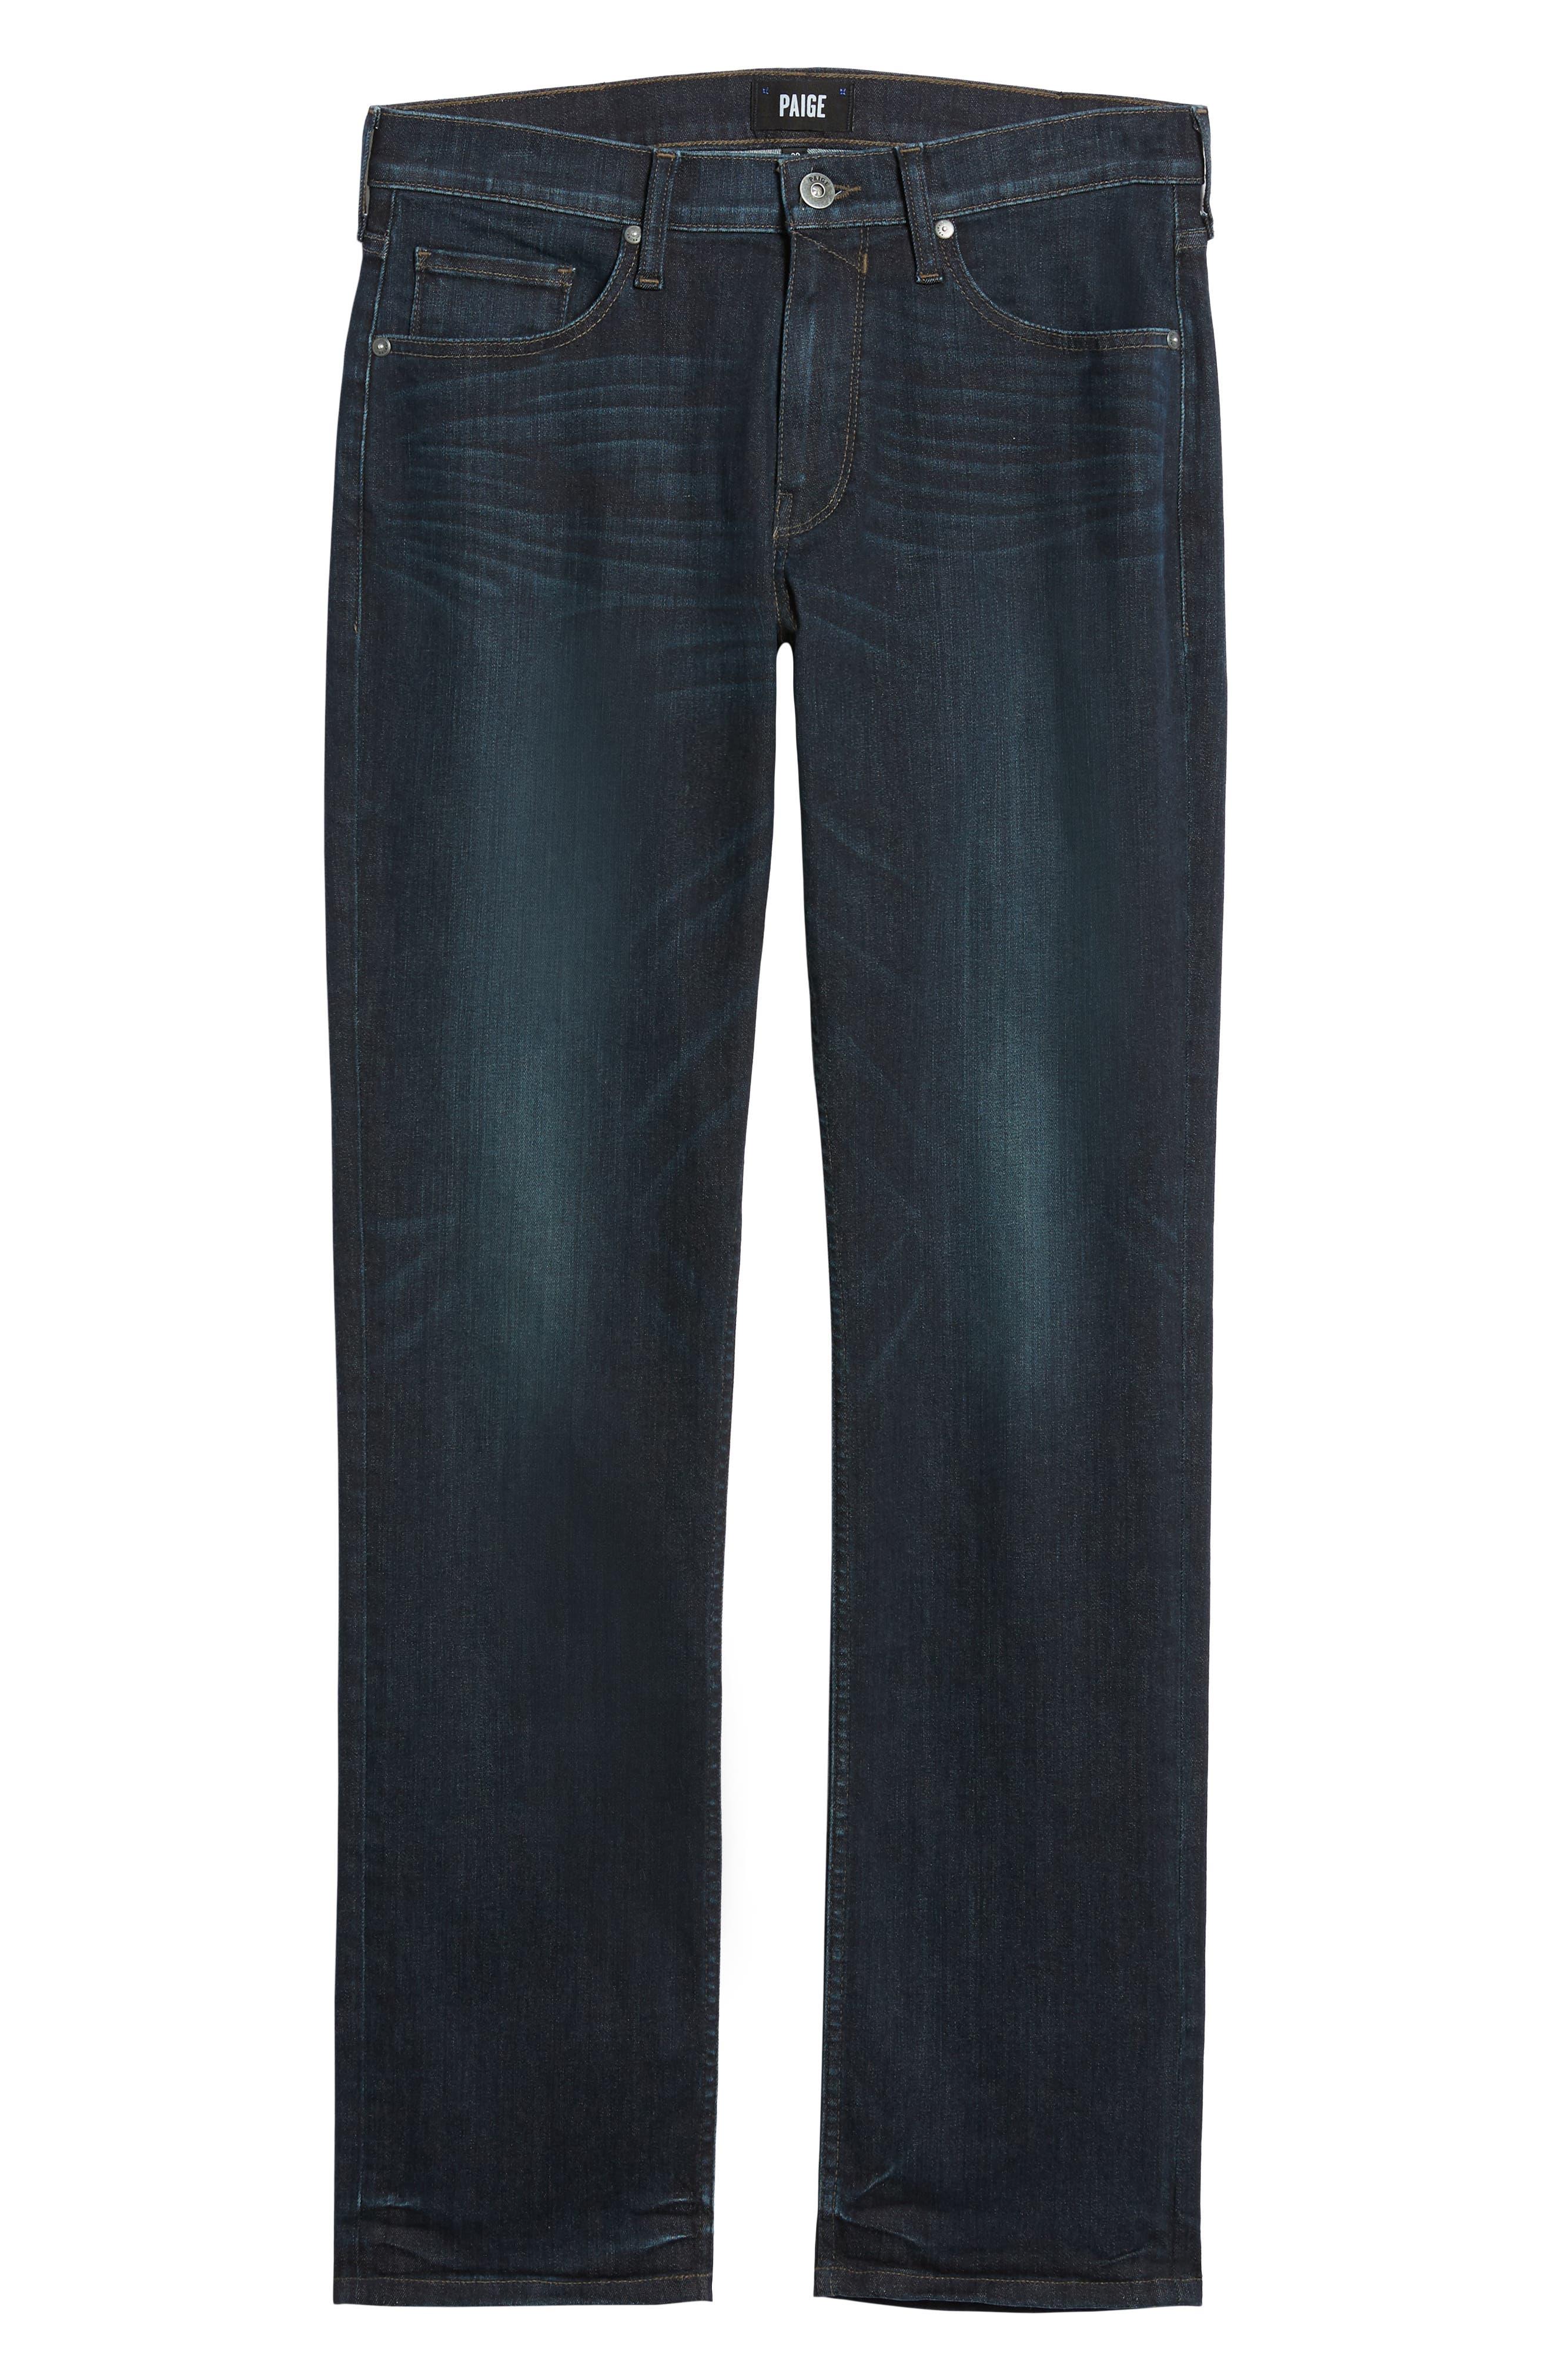 Transcend - Normandie Straight Leg Jeans,                             Alternate thumbnail 6, color,                             KENAN